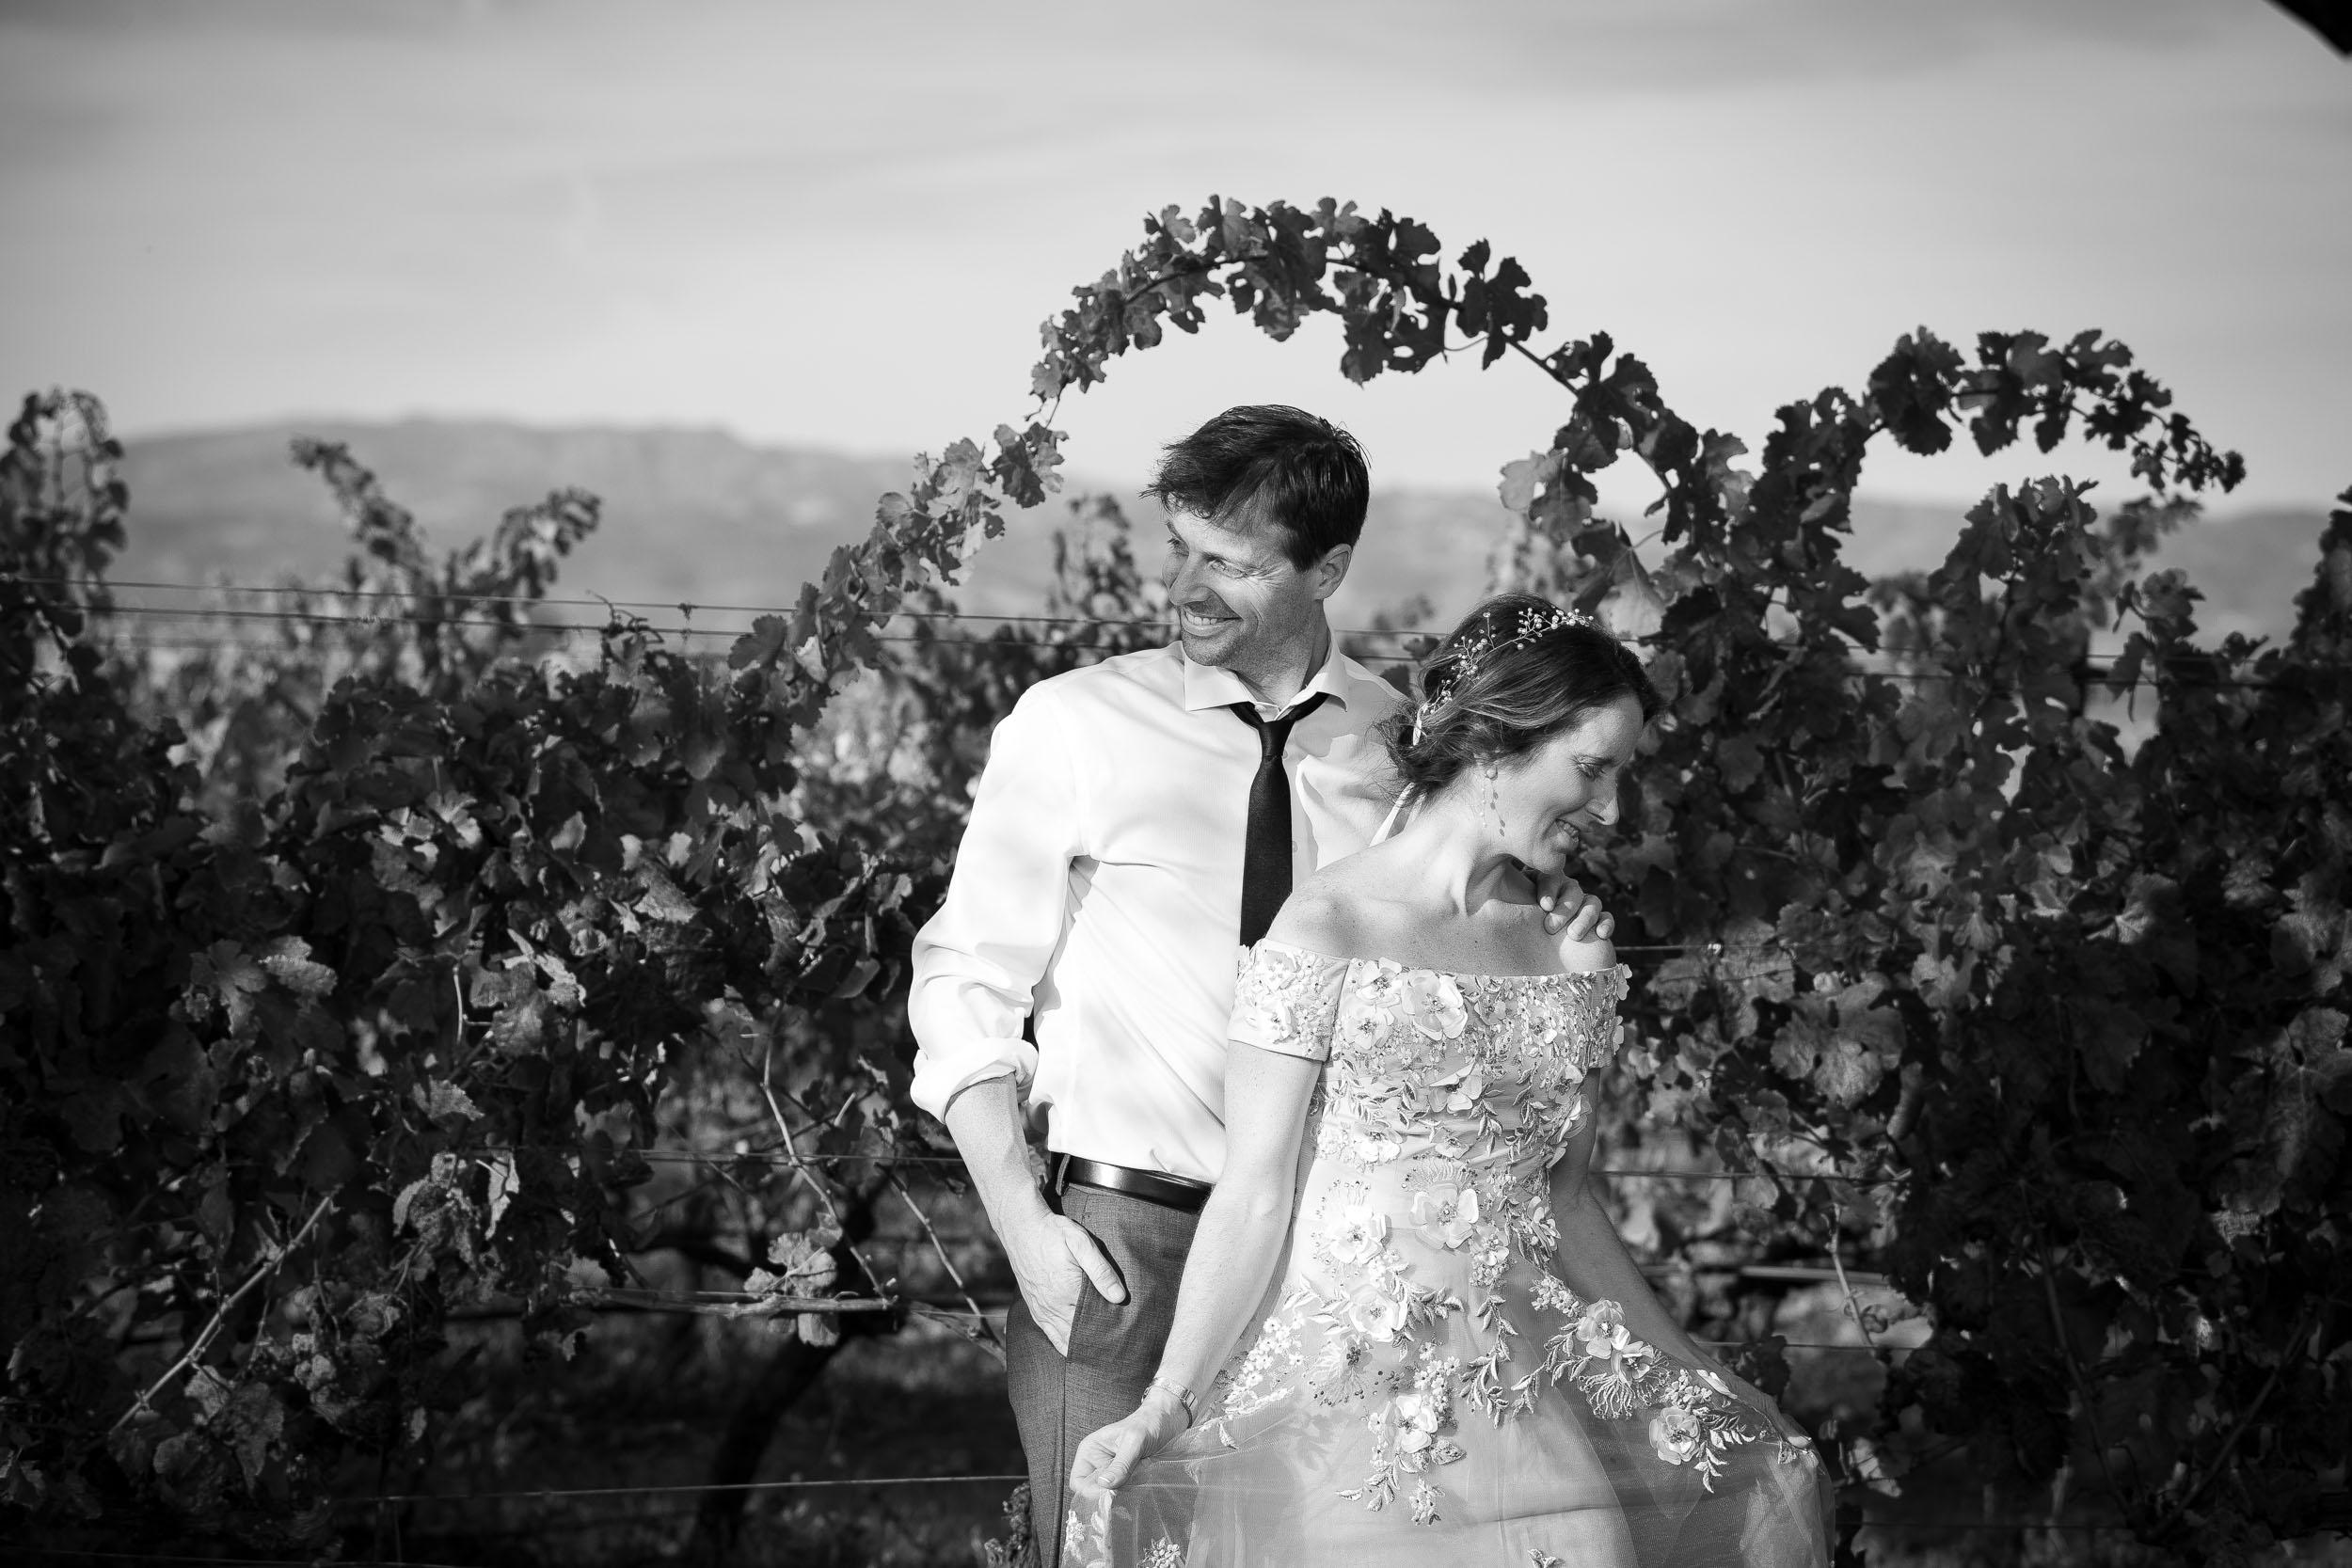 Jacuzzi Family Vineyards Wedding Photos-21.jpg